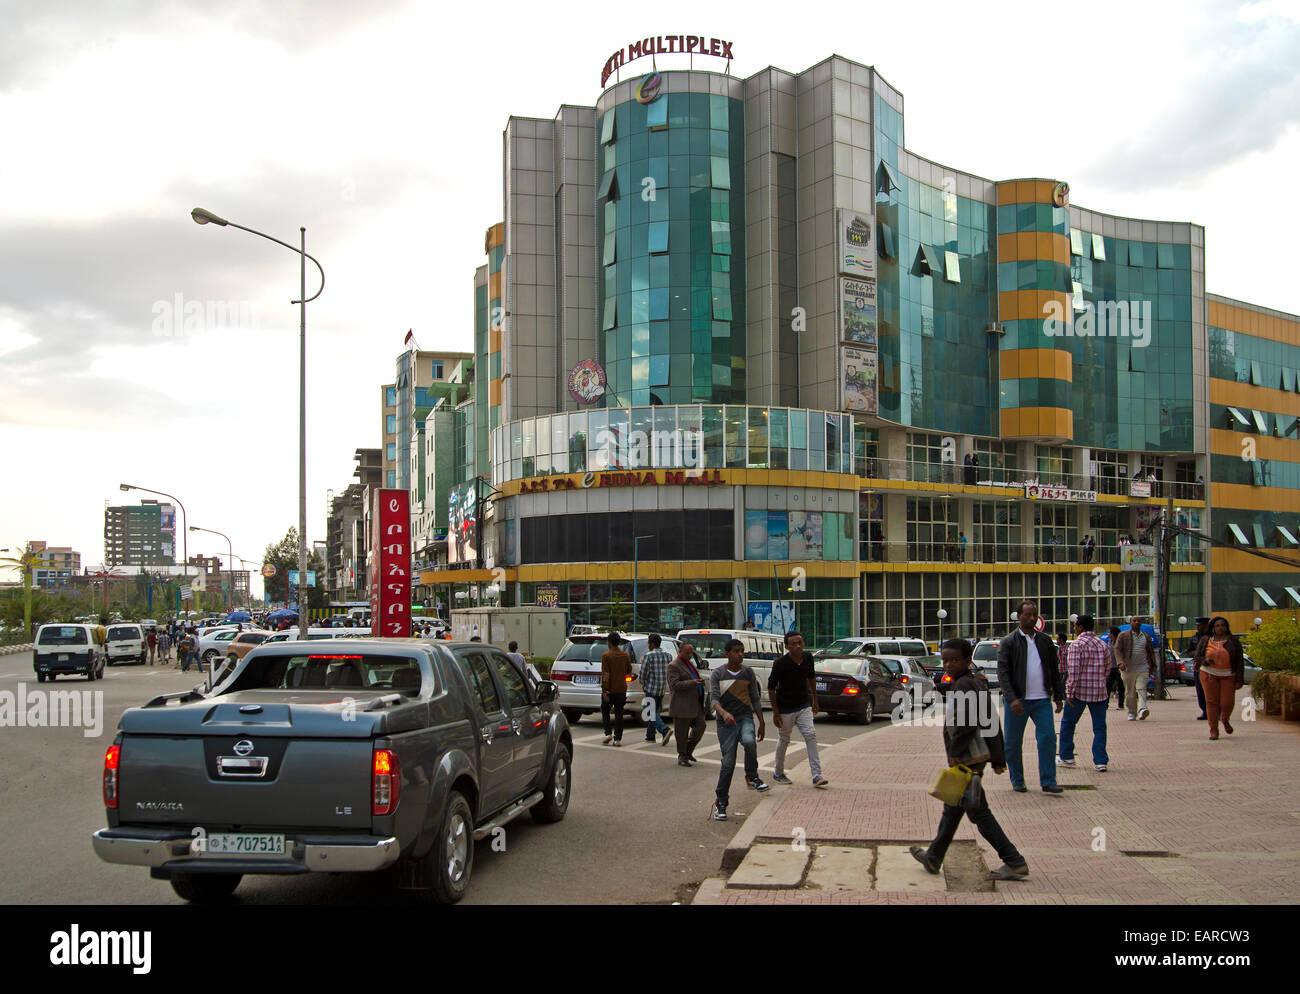 Edna Mall supermarket with the Matti Multiplex cinema, Medhane Alem Circle, Addis Ababa, Ethiopia - Stock Image